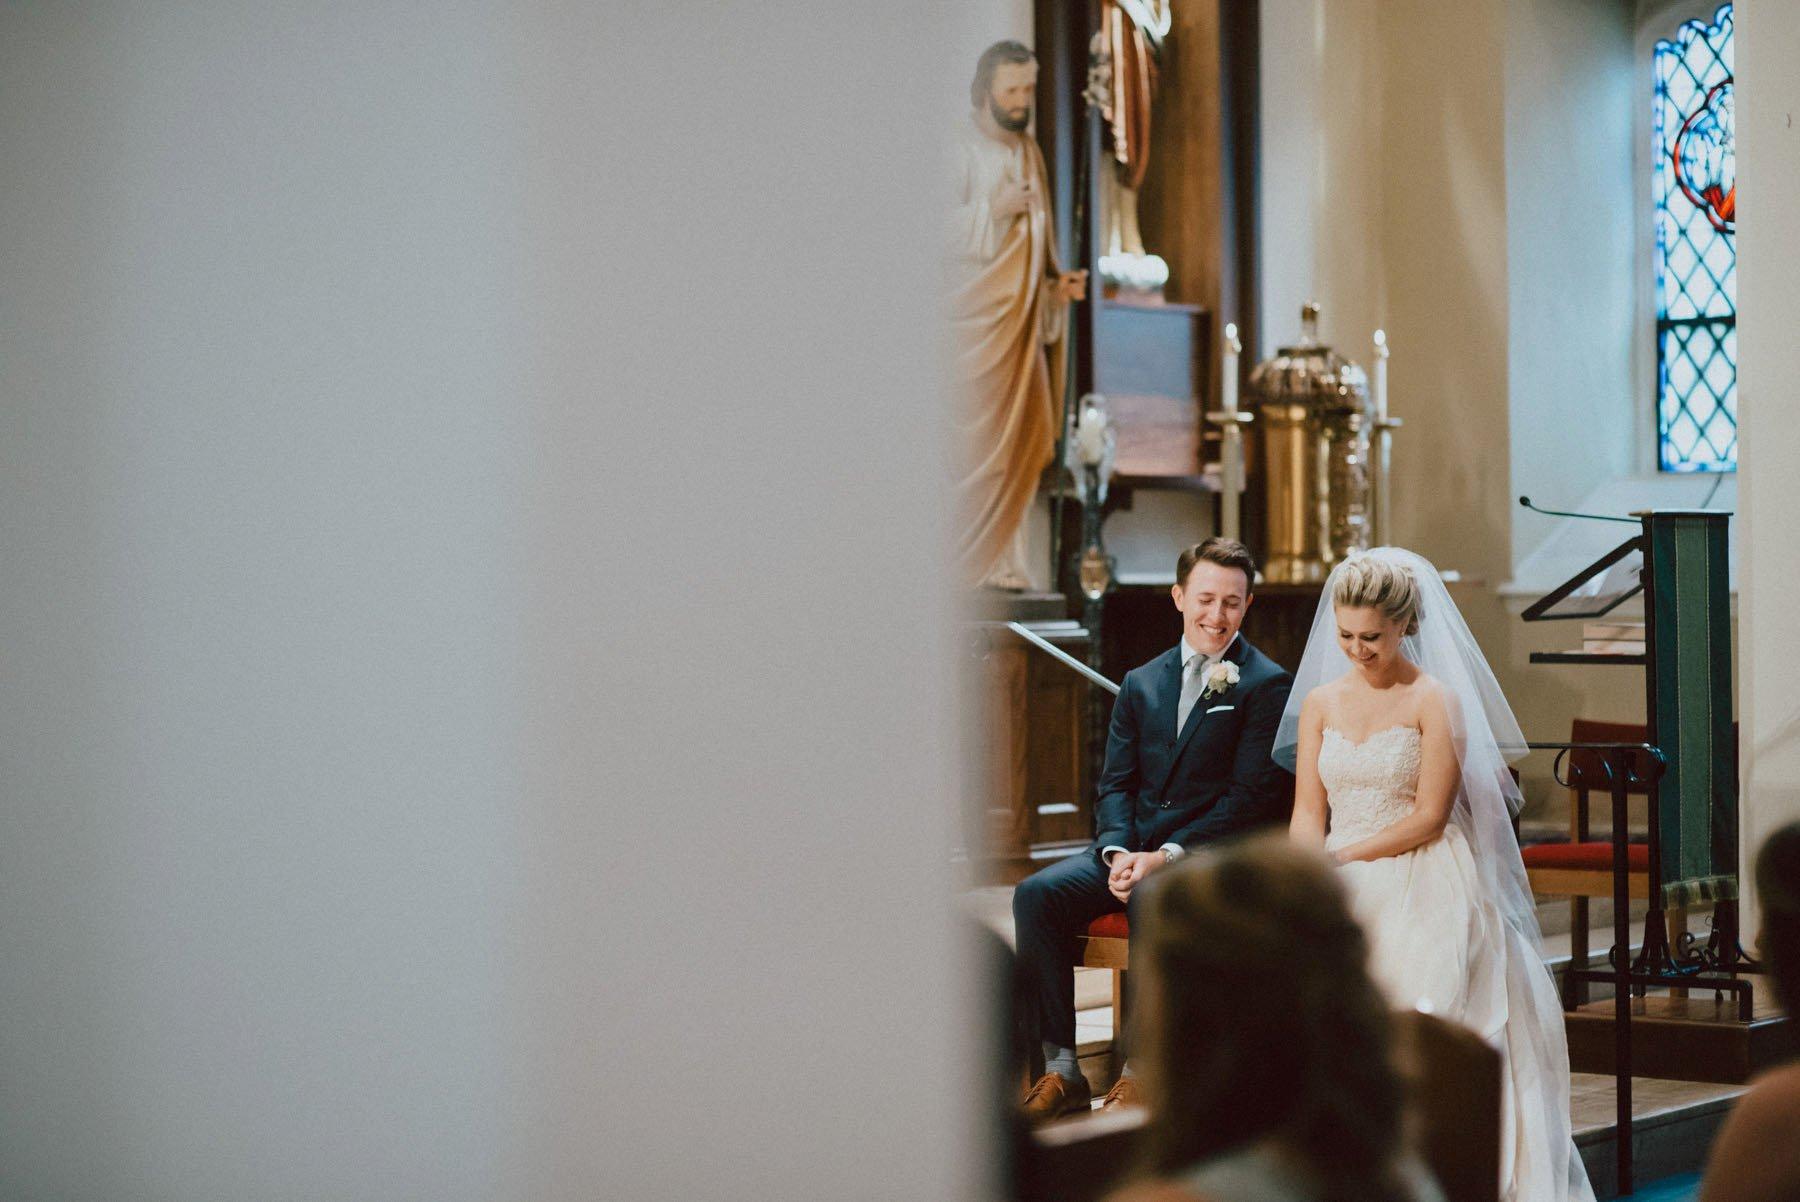 greenville-country-club-wedding-49.jpg